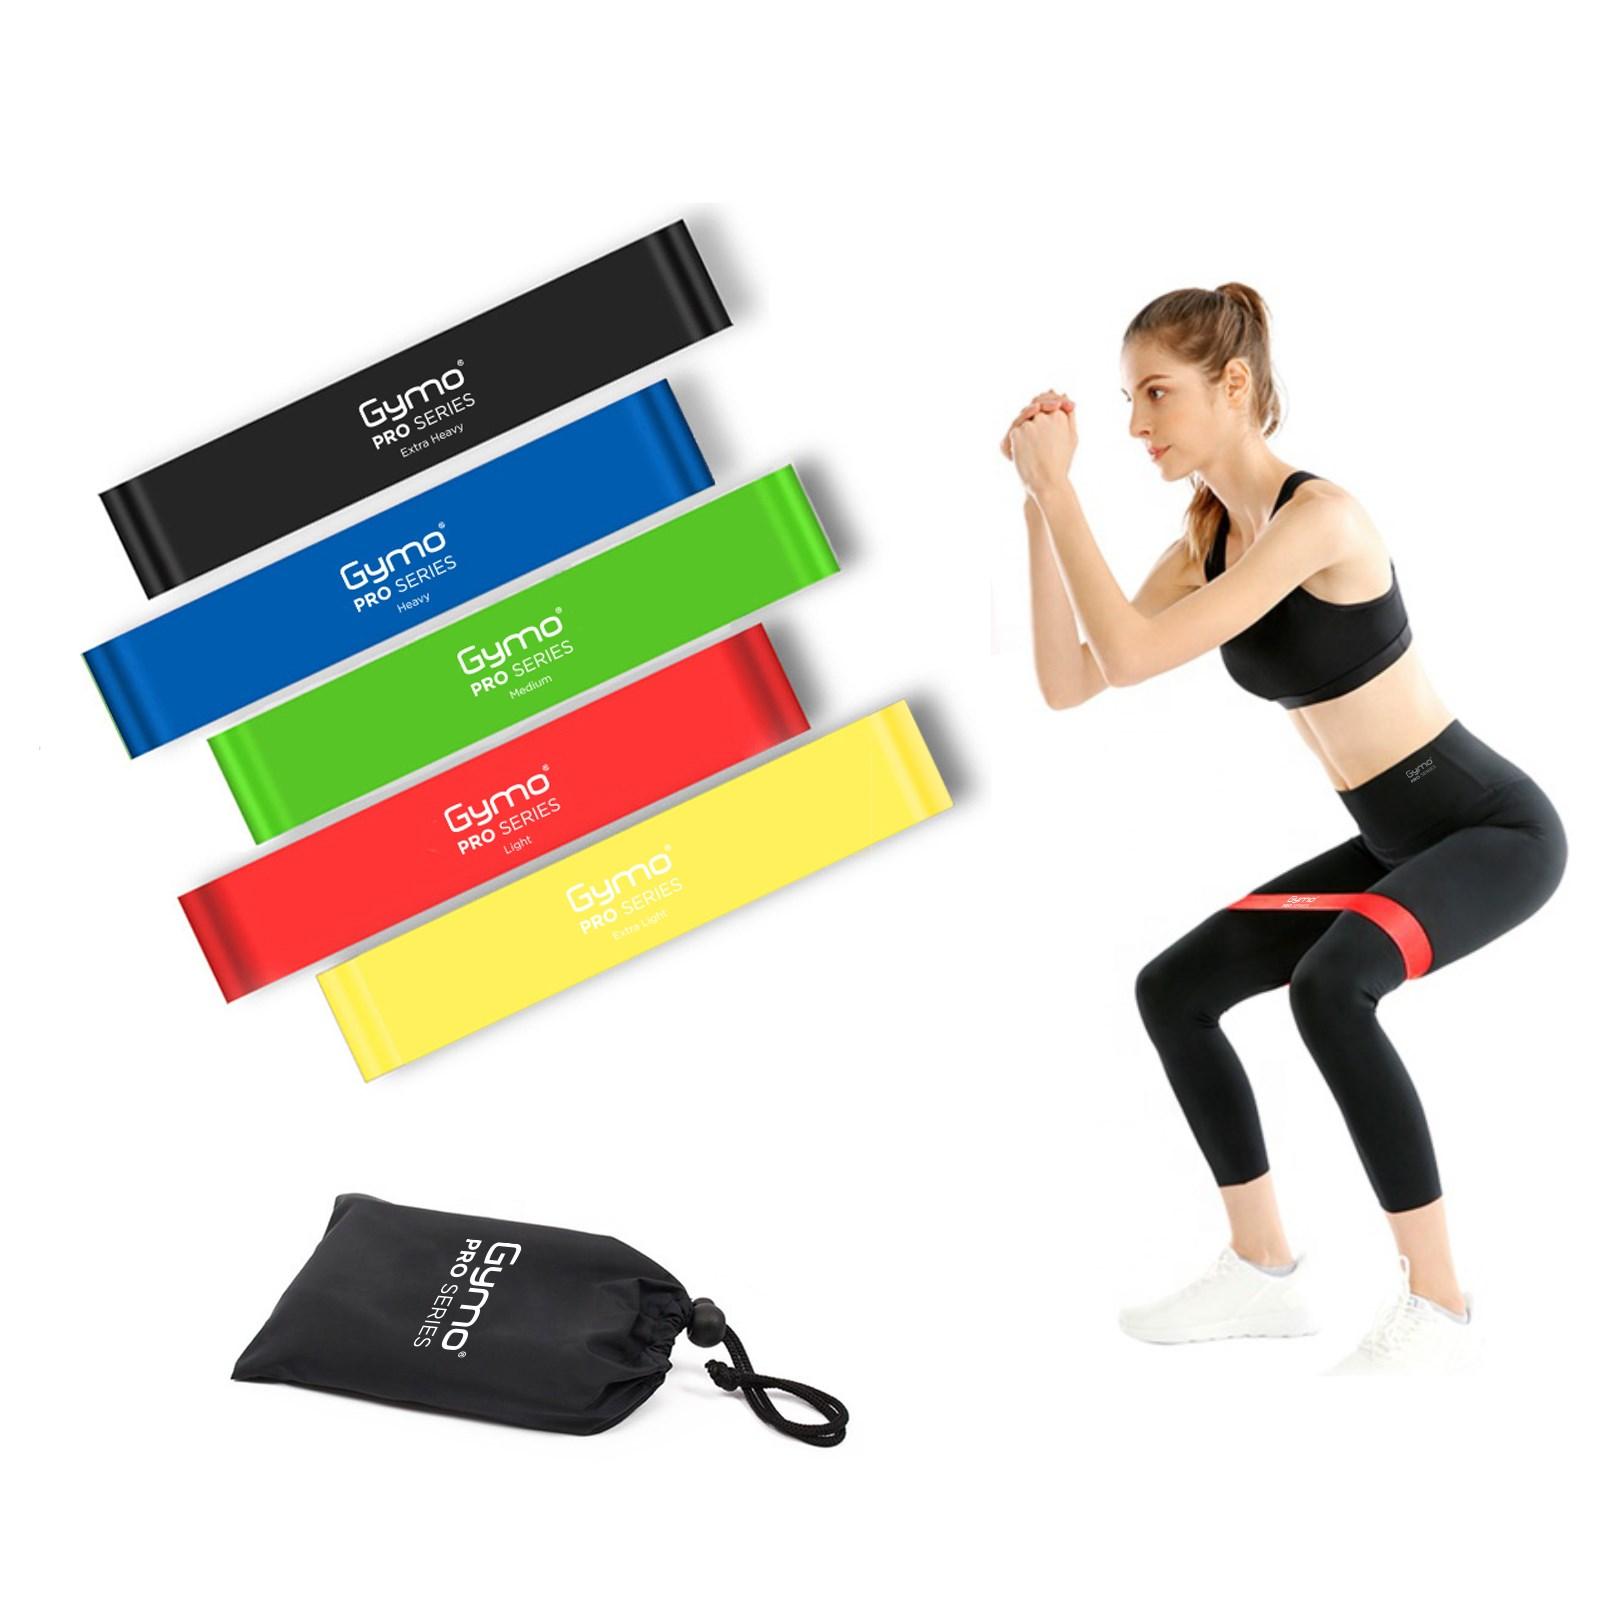 GYMO SPORTS - Gymo Çantalı Direnç Bandı Fitness Pilates Esnetme Lastiği 5'li Set